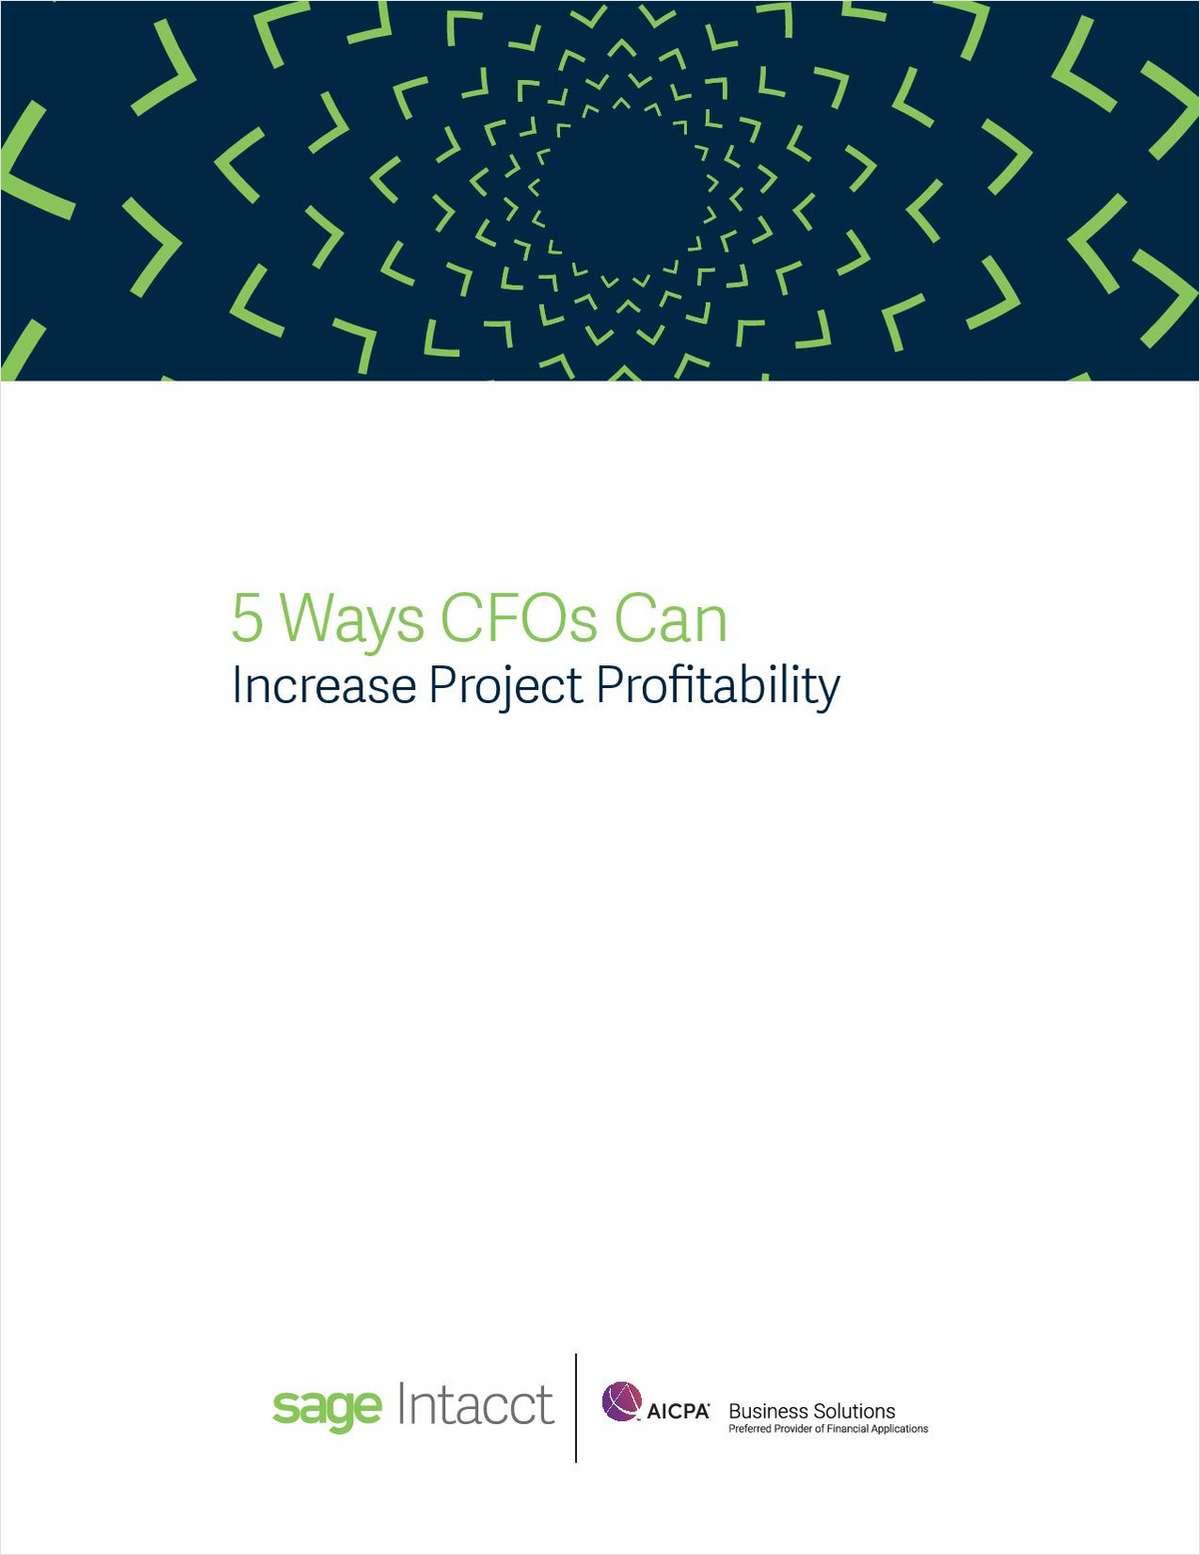 5 Ways CFOs Can Increase Project Profitability